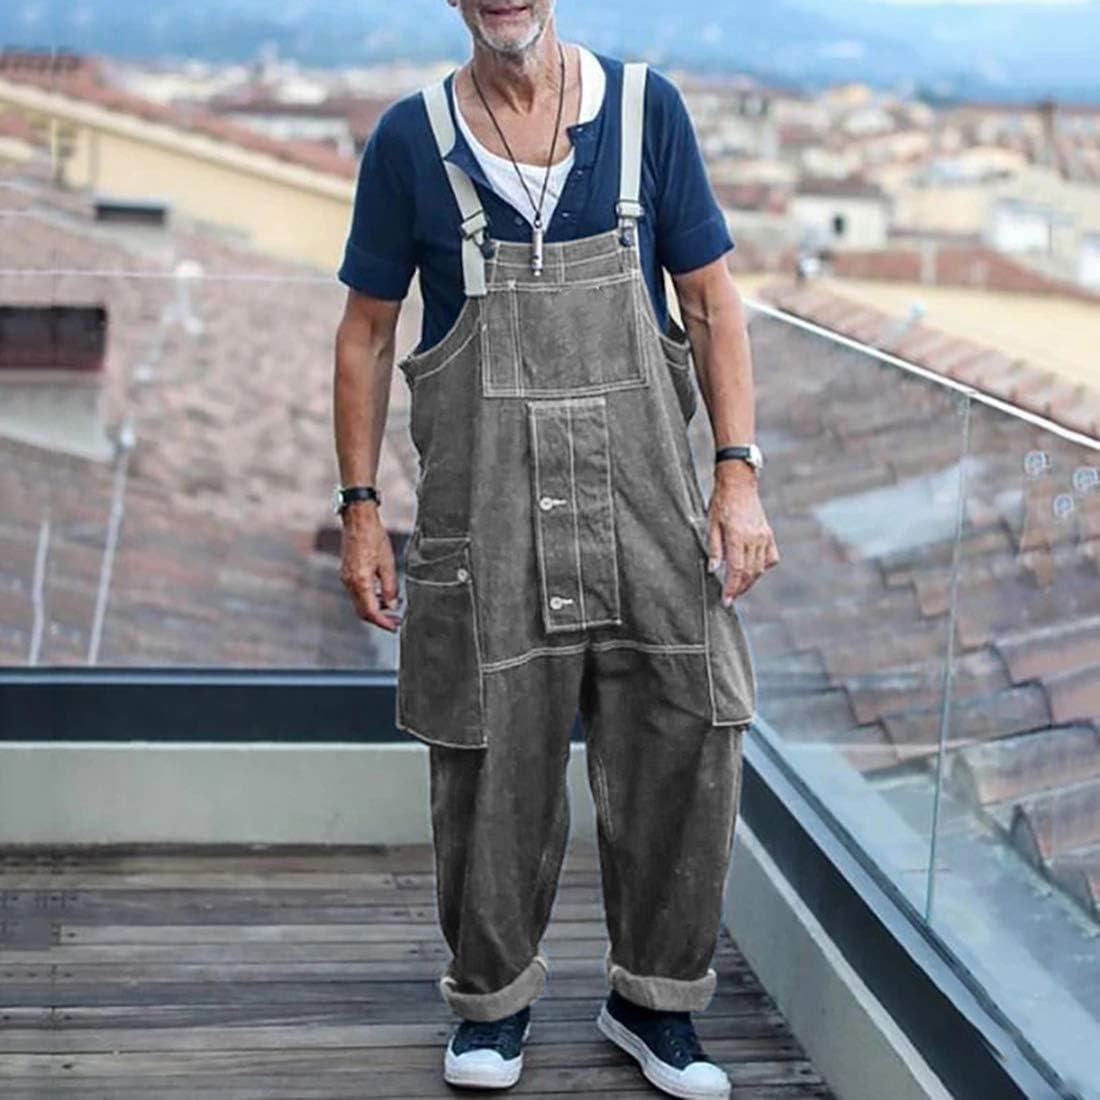 papasgix Herren Overalls Retro Latzhose Lang Einfarbrig Jumpsuit Mode Lose Denim Jeans Sommer Herbst Oversize Jeanshose Jumpsuit Overalls